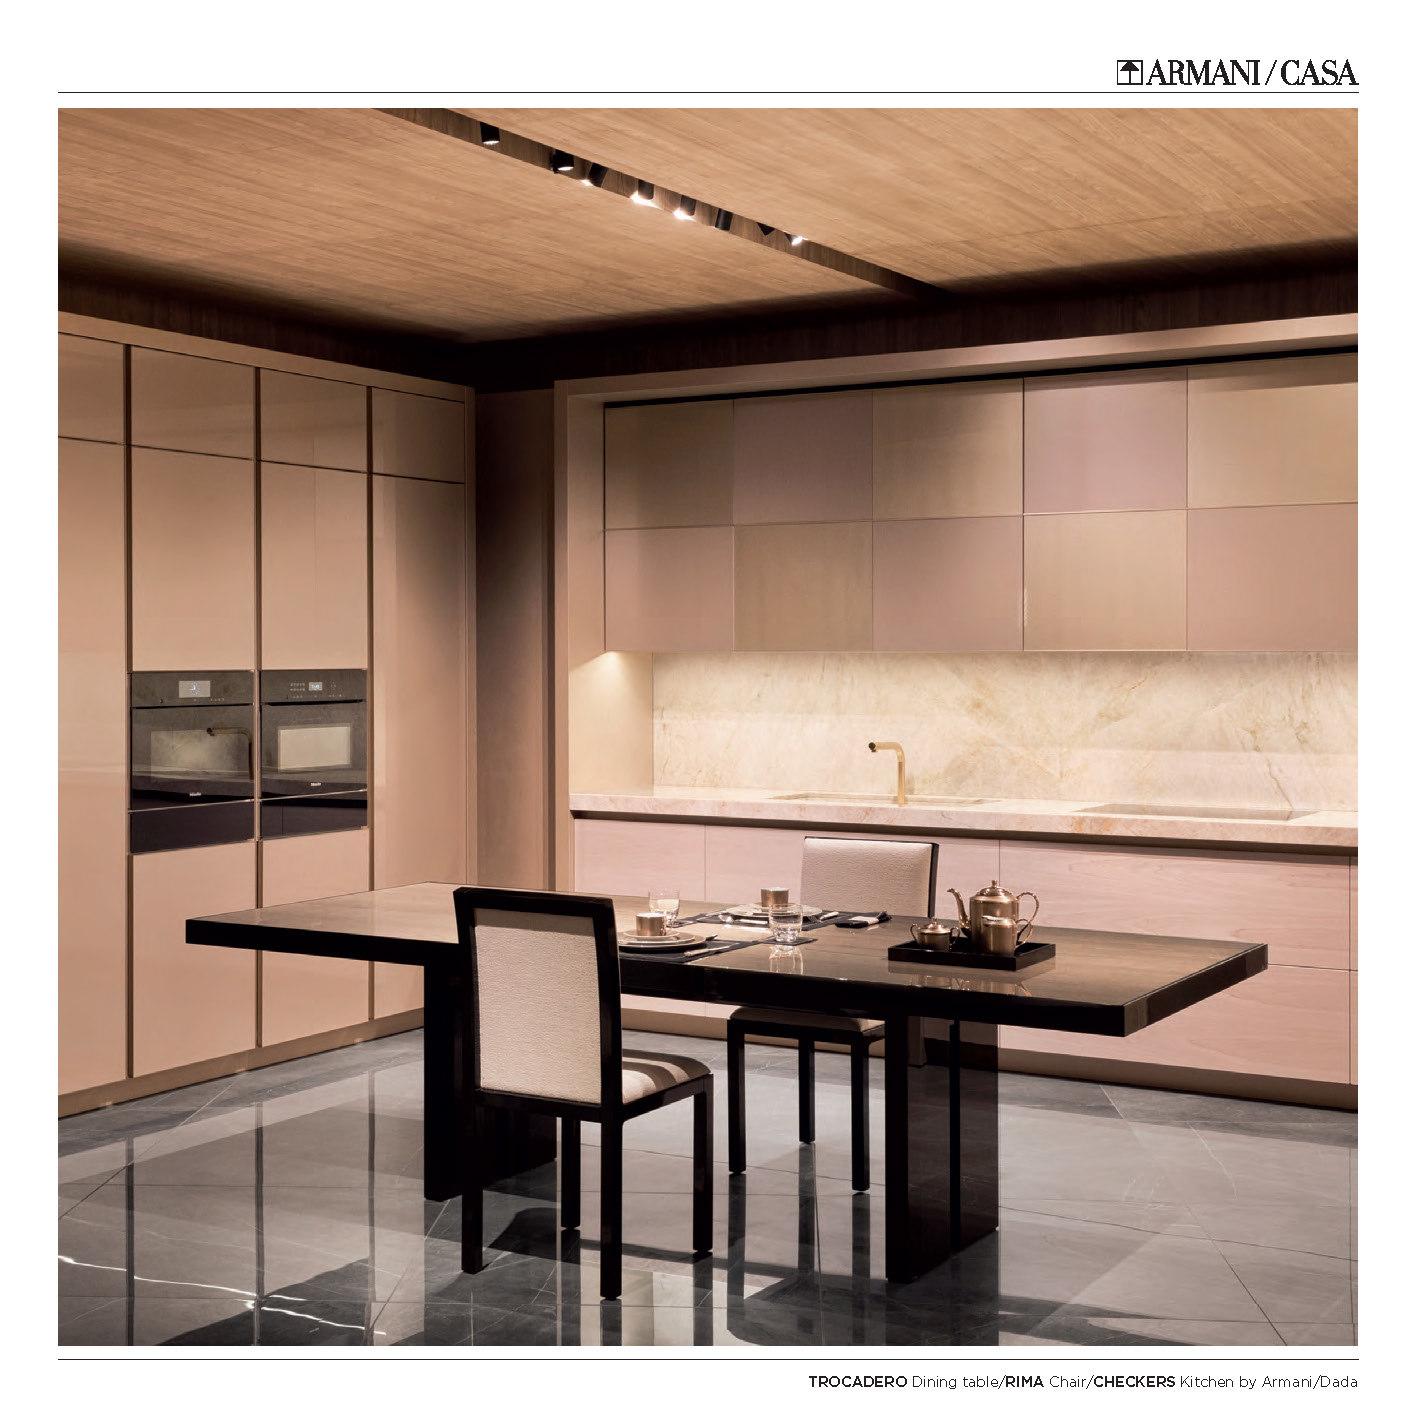 Armani Home Interiors | The Armani Casa Interiors Combine Urban Style With Nature Luxury